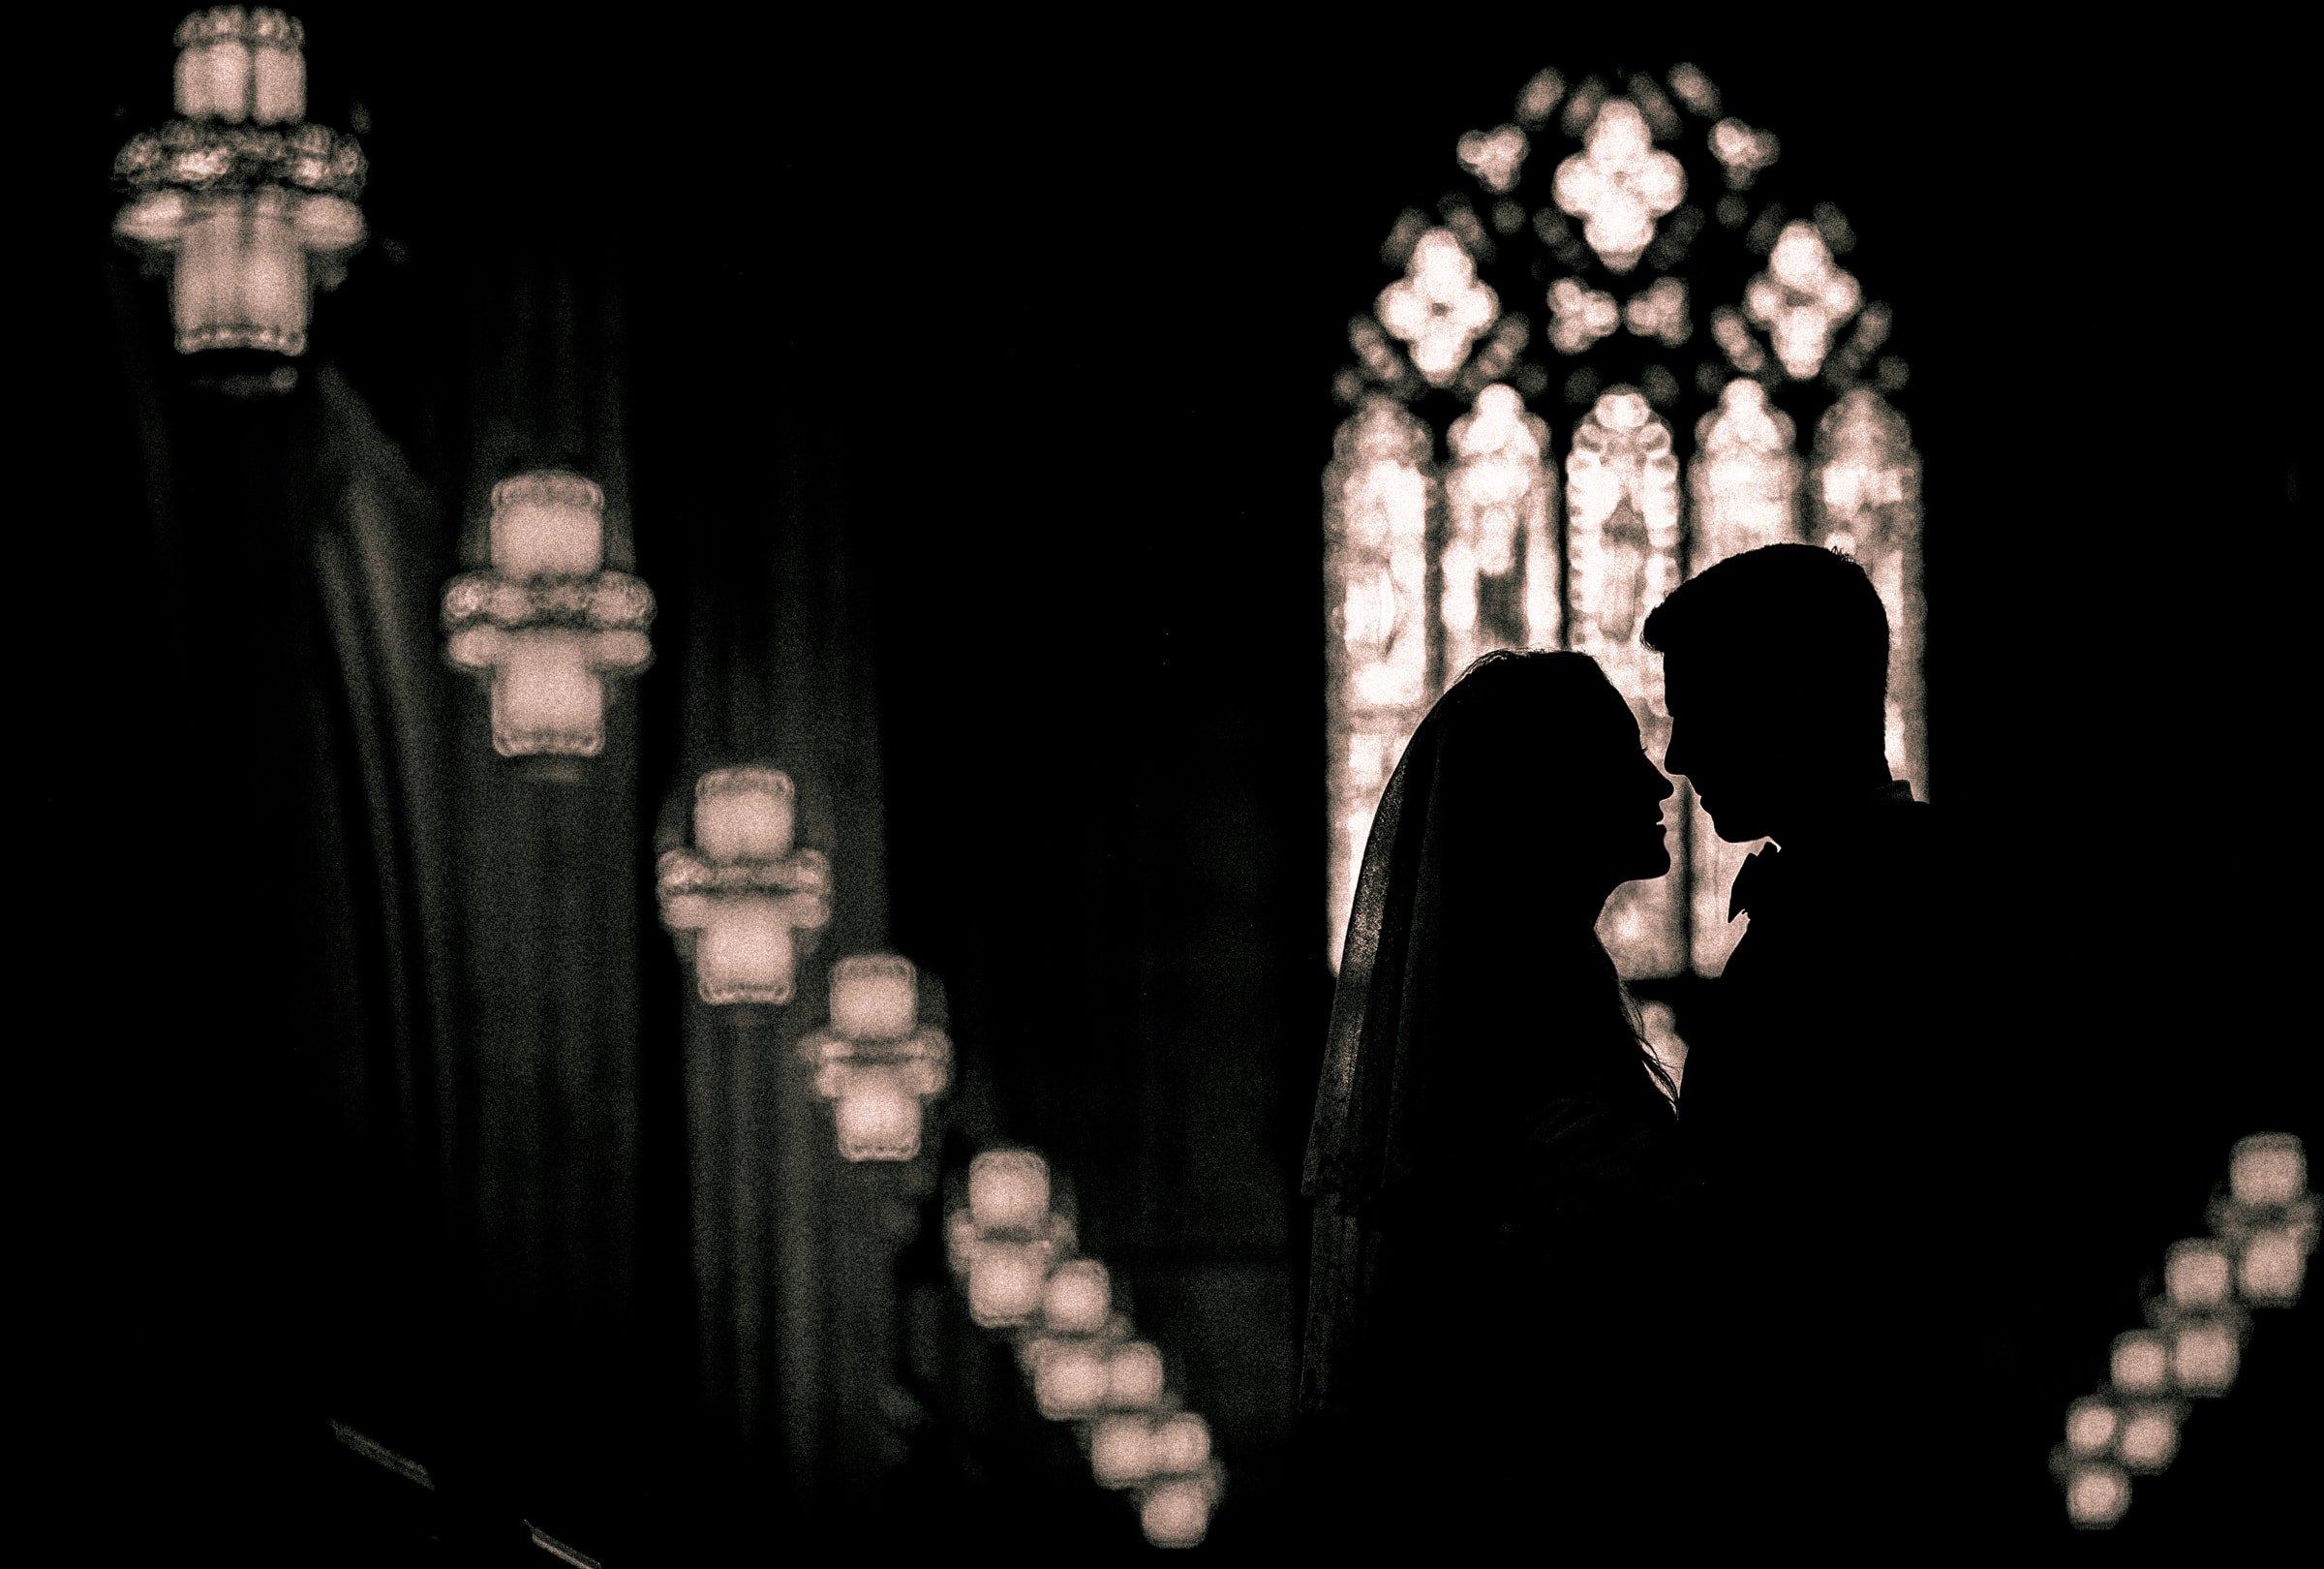 Duke Chapel Wedding Photography - Bride and Groom Silhouette by Joe Payne